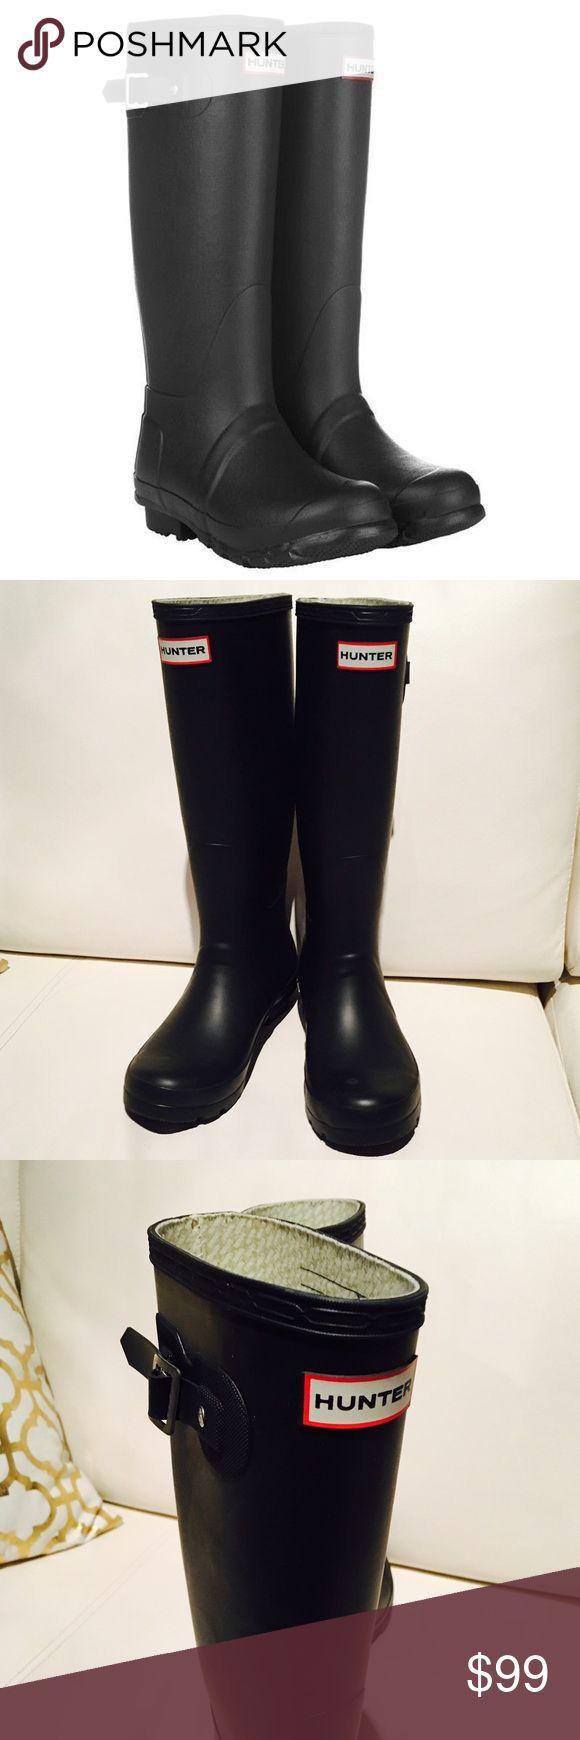 1000  ideas about Black Rain Boots on Pinterest | Hunter boots